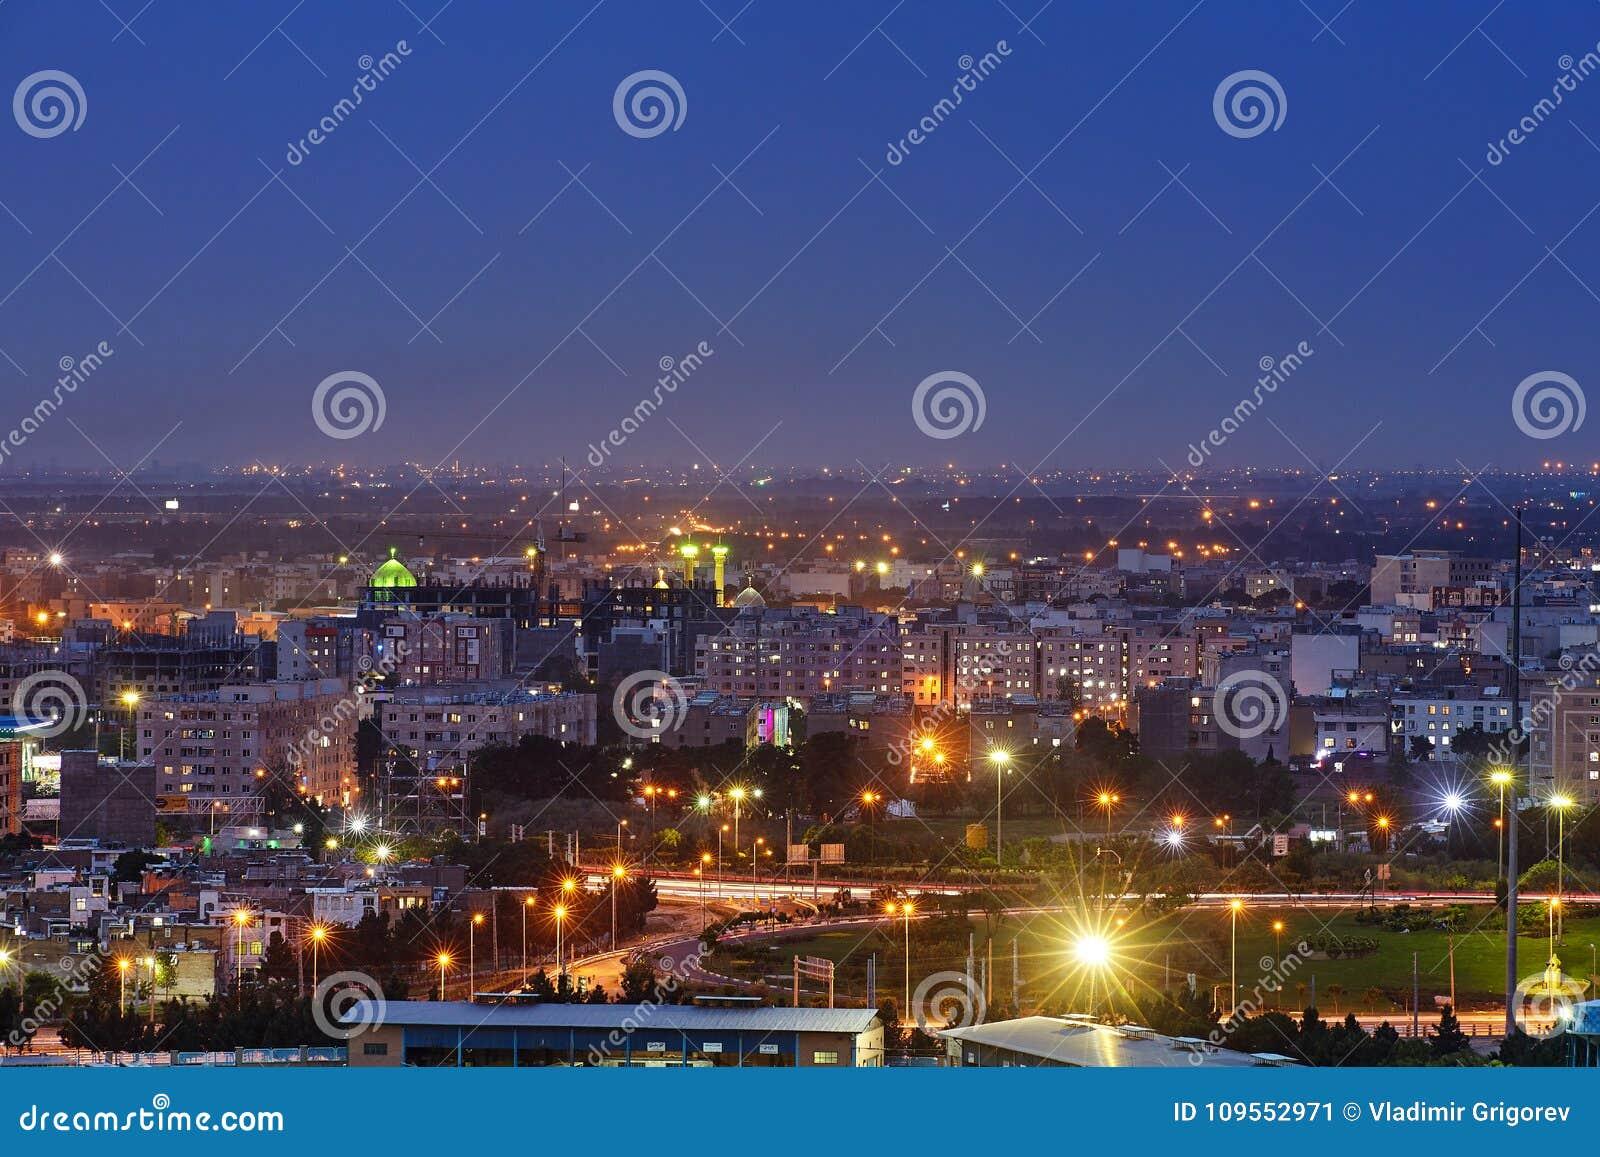 Top view of city in night illumination, Tehran, Iran.